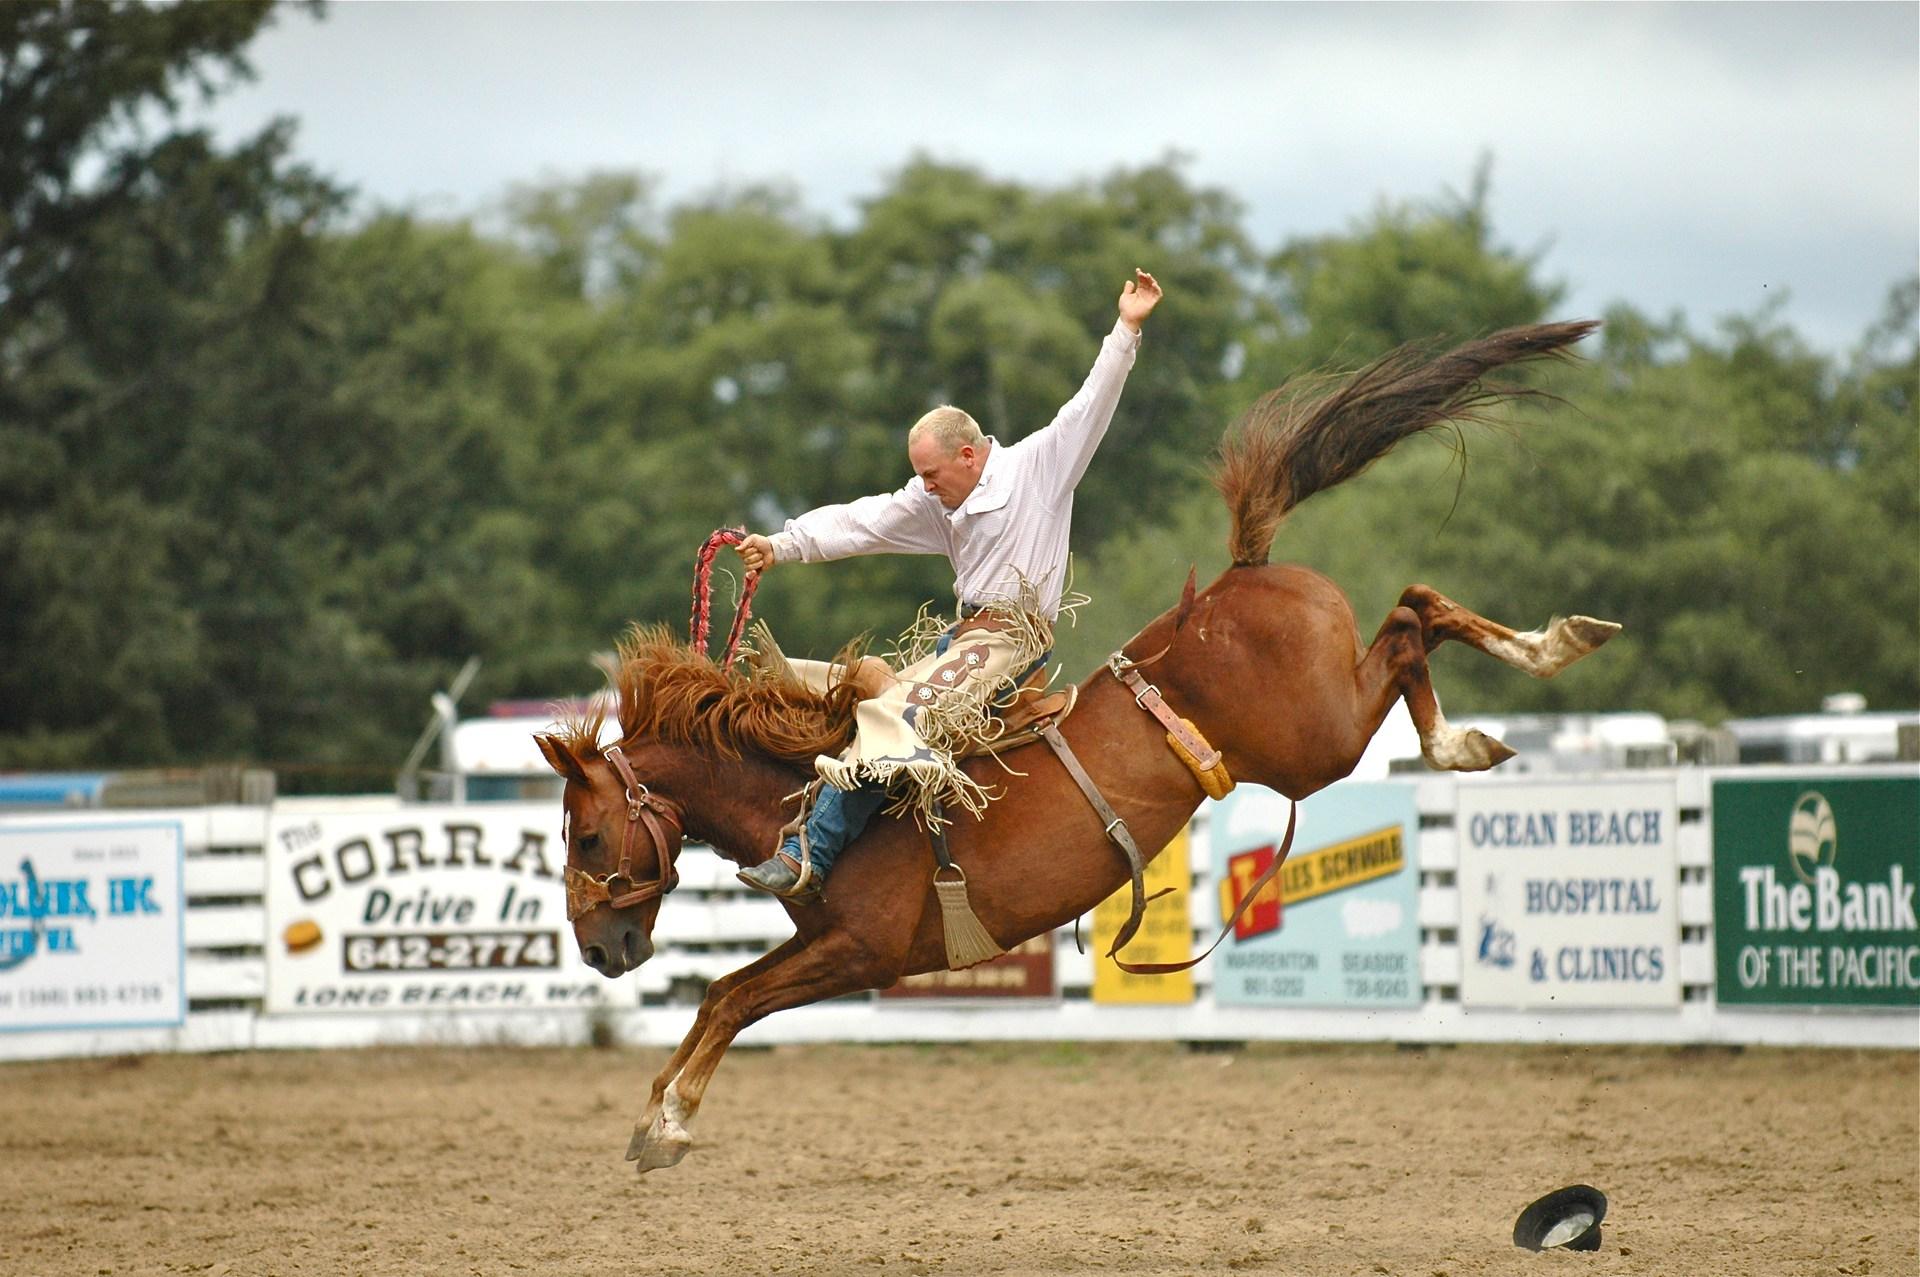 Cowboy riding a bucking bronc, Long Beach Rodeo.